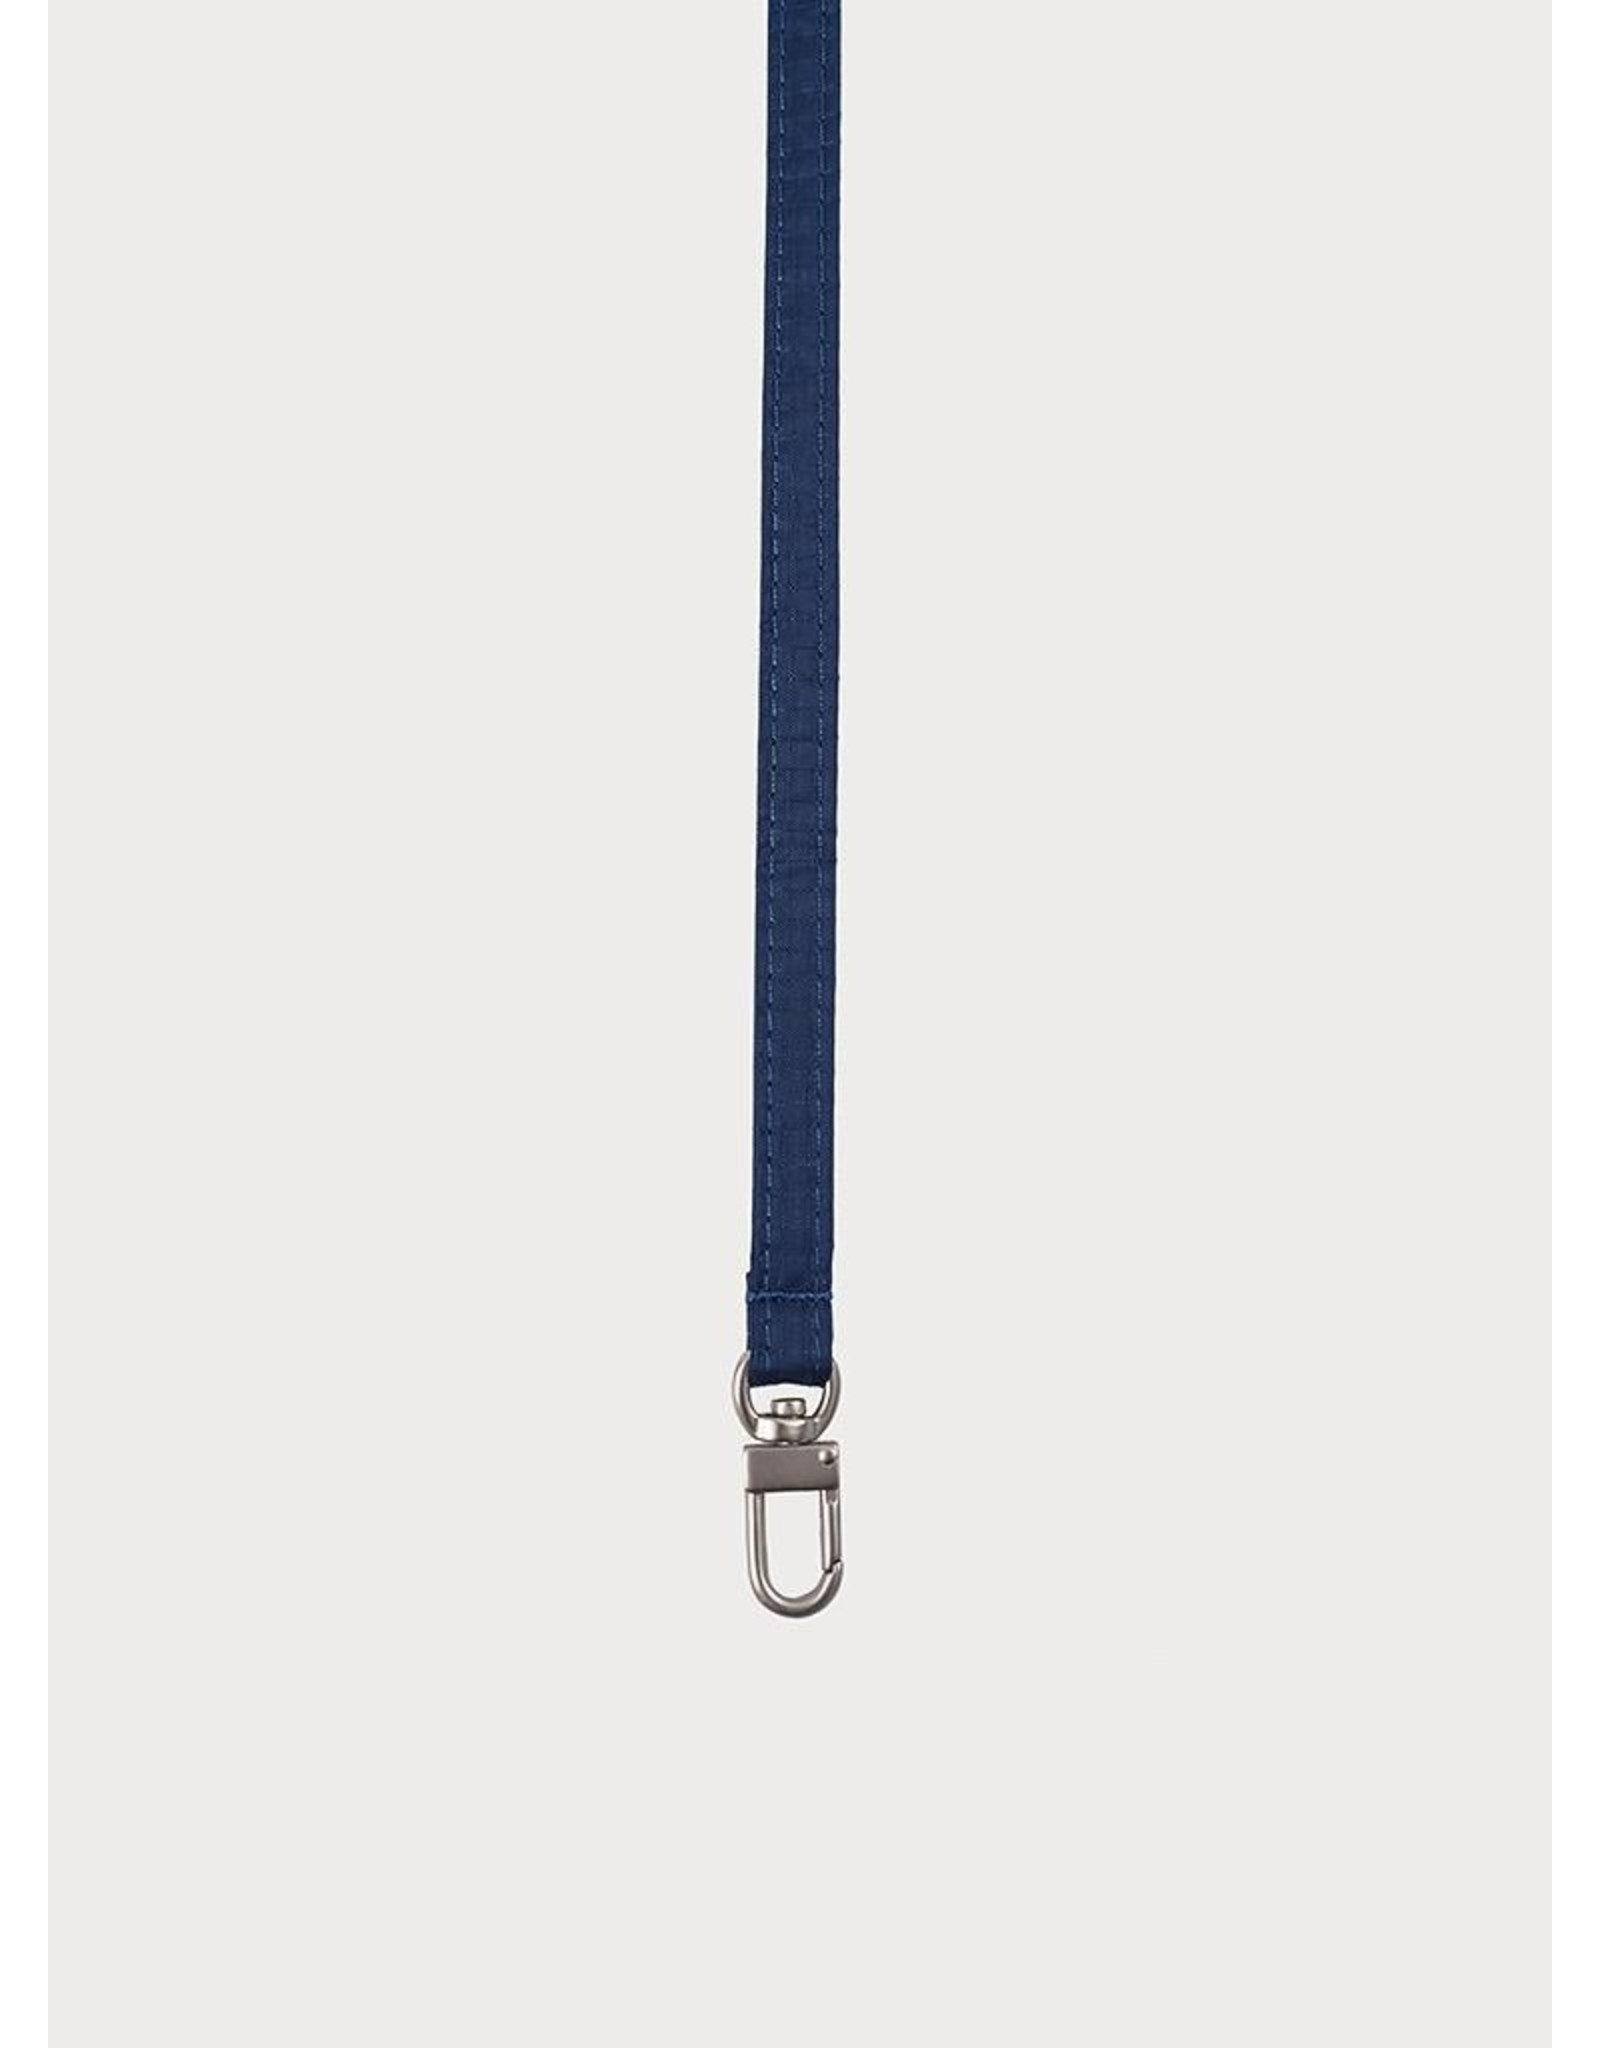 Susan Bijl Strap, Navy | 58 - 122cm